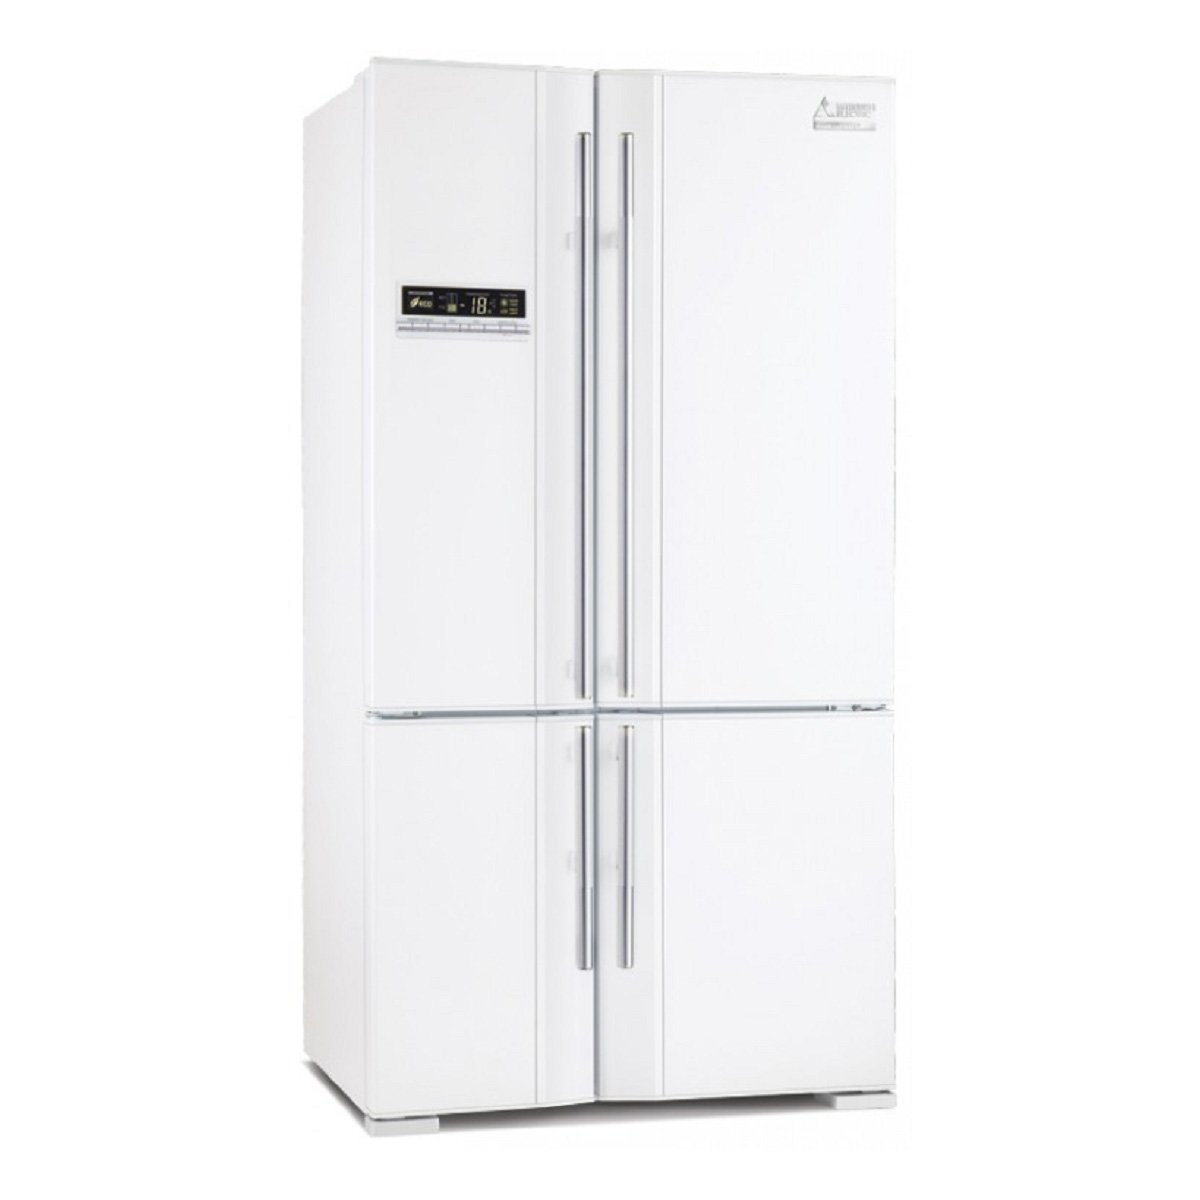 Mitsubishi MRL710EGPWHA Refrigerator